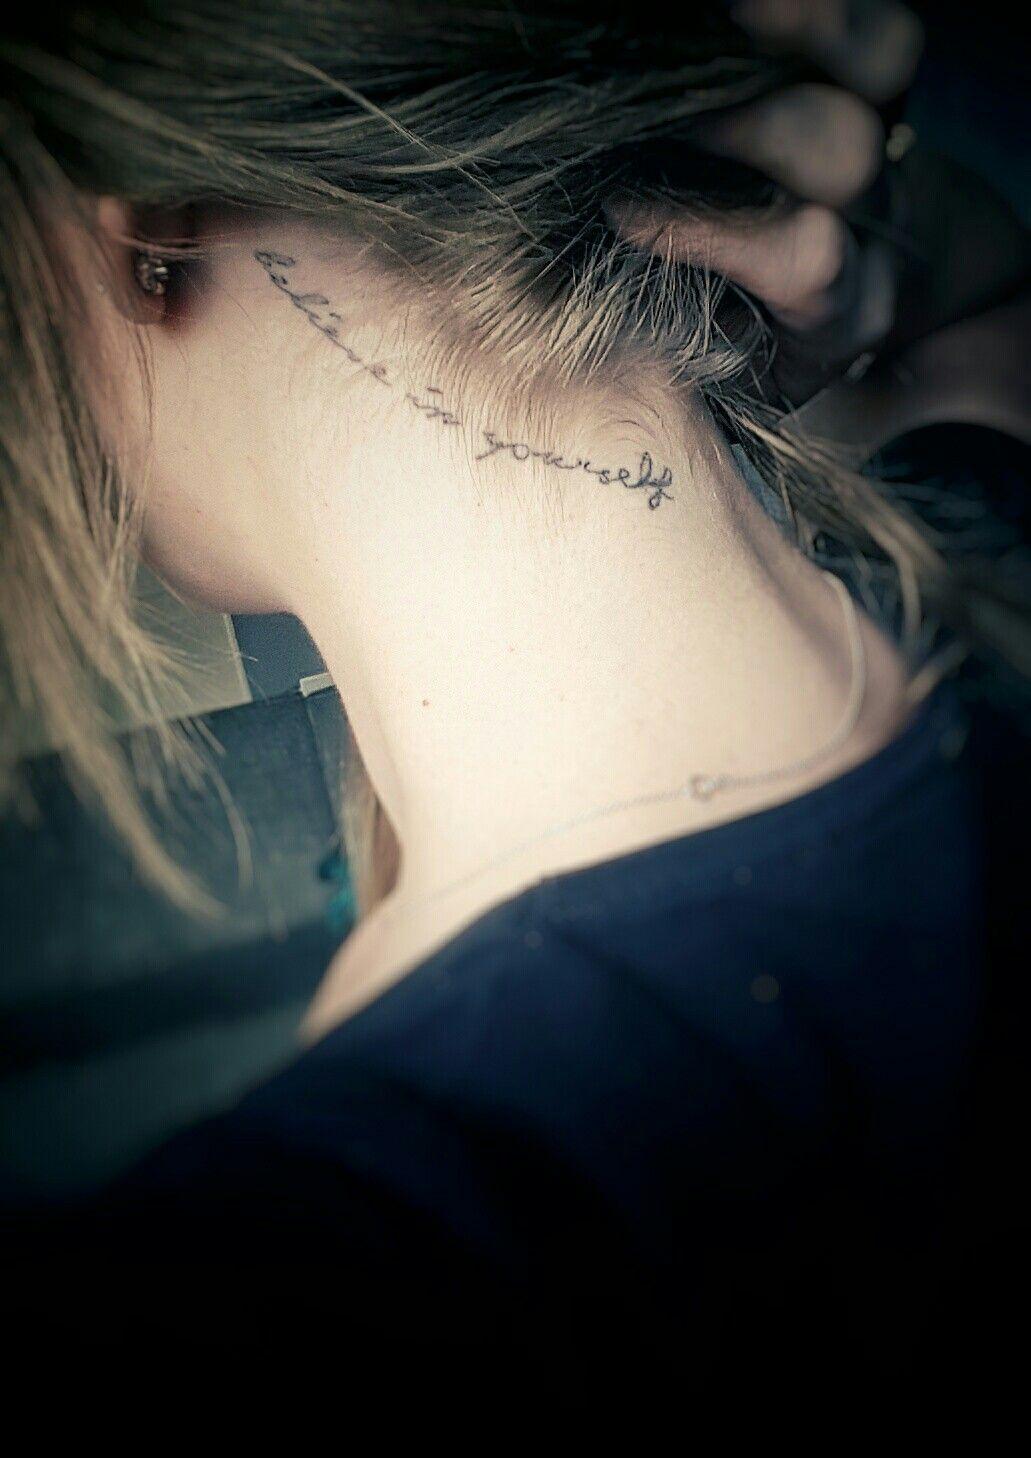 My Neck Tattoo Believe In Yourself I Really Love The Placement Tessa H Tatuagem Believe Tatuagens Especiais Tatoo Delicada